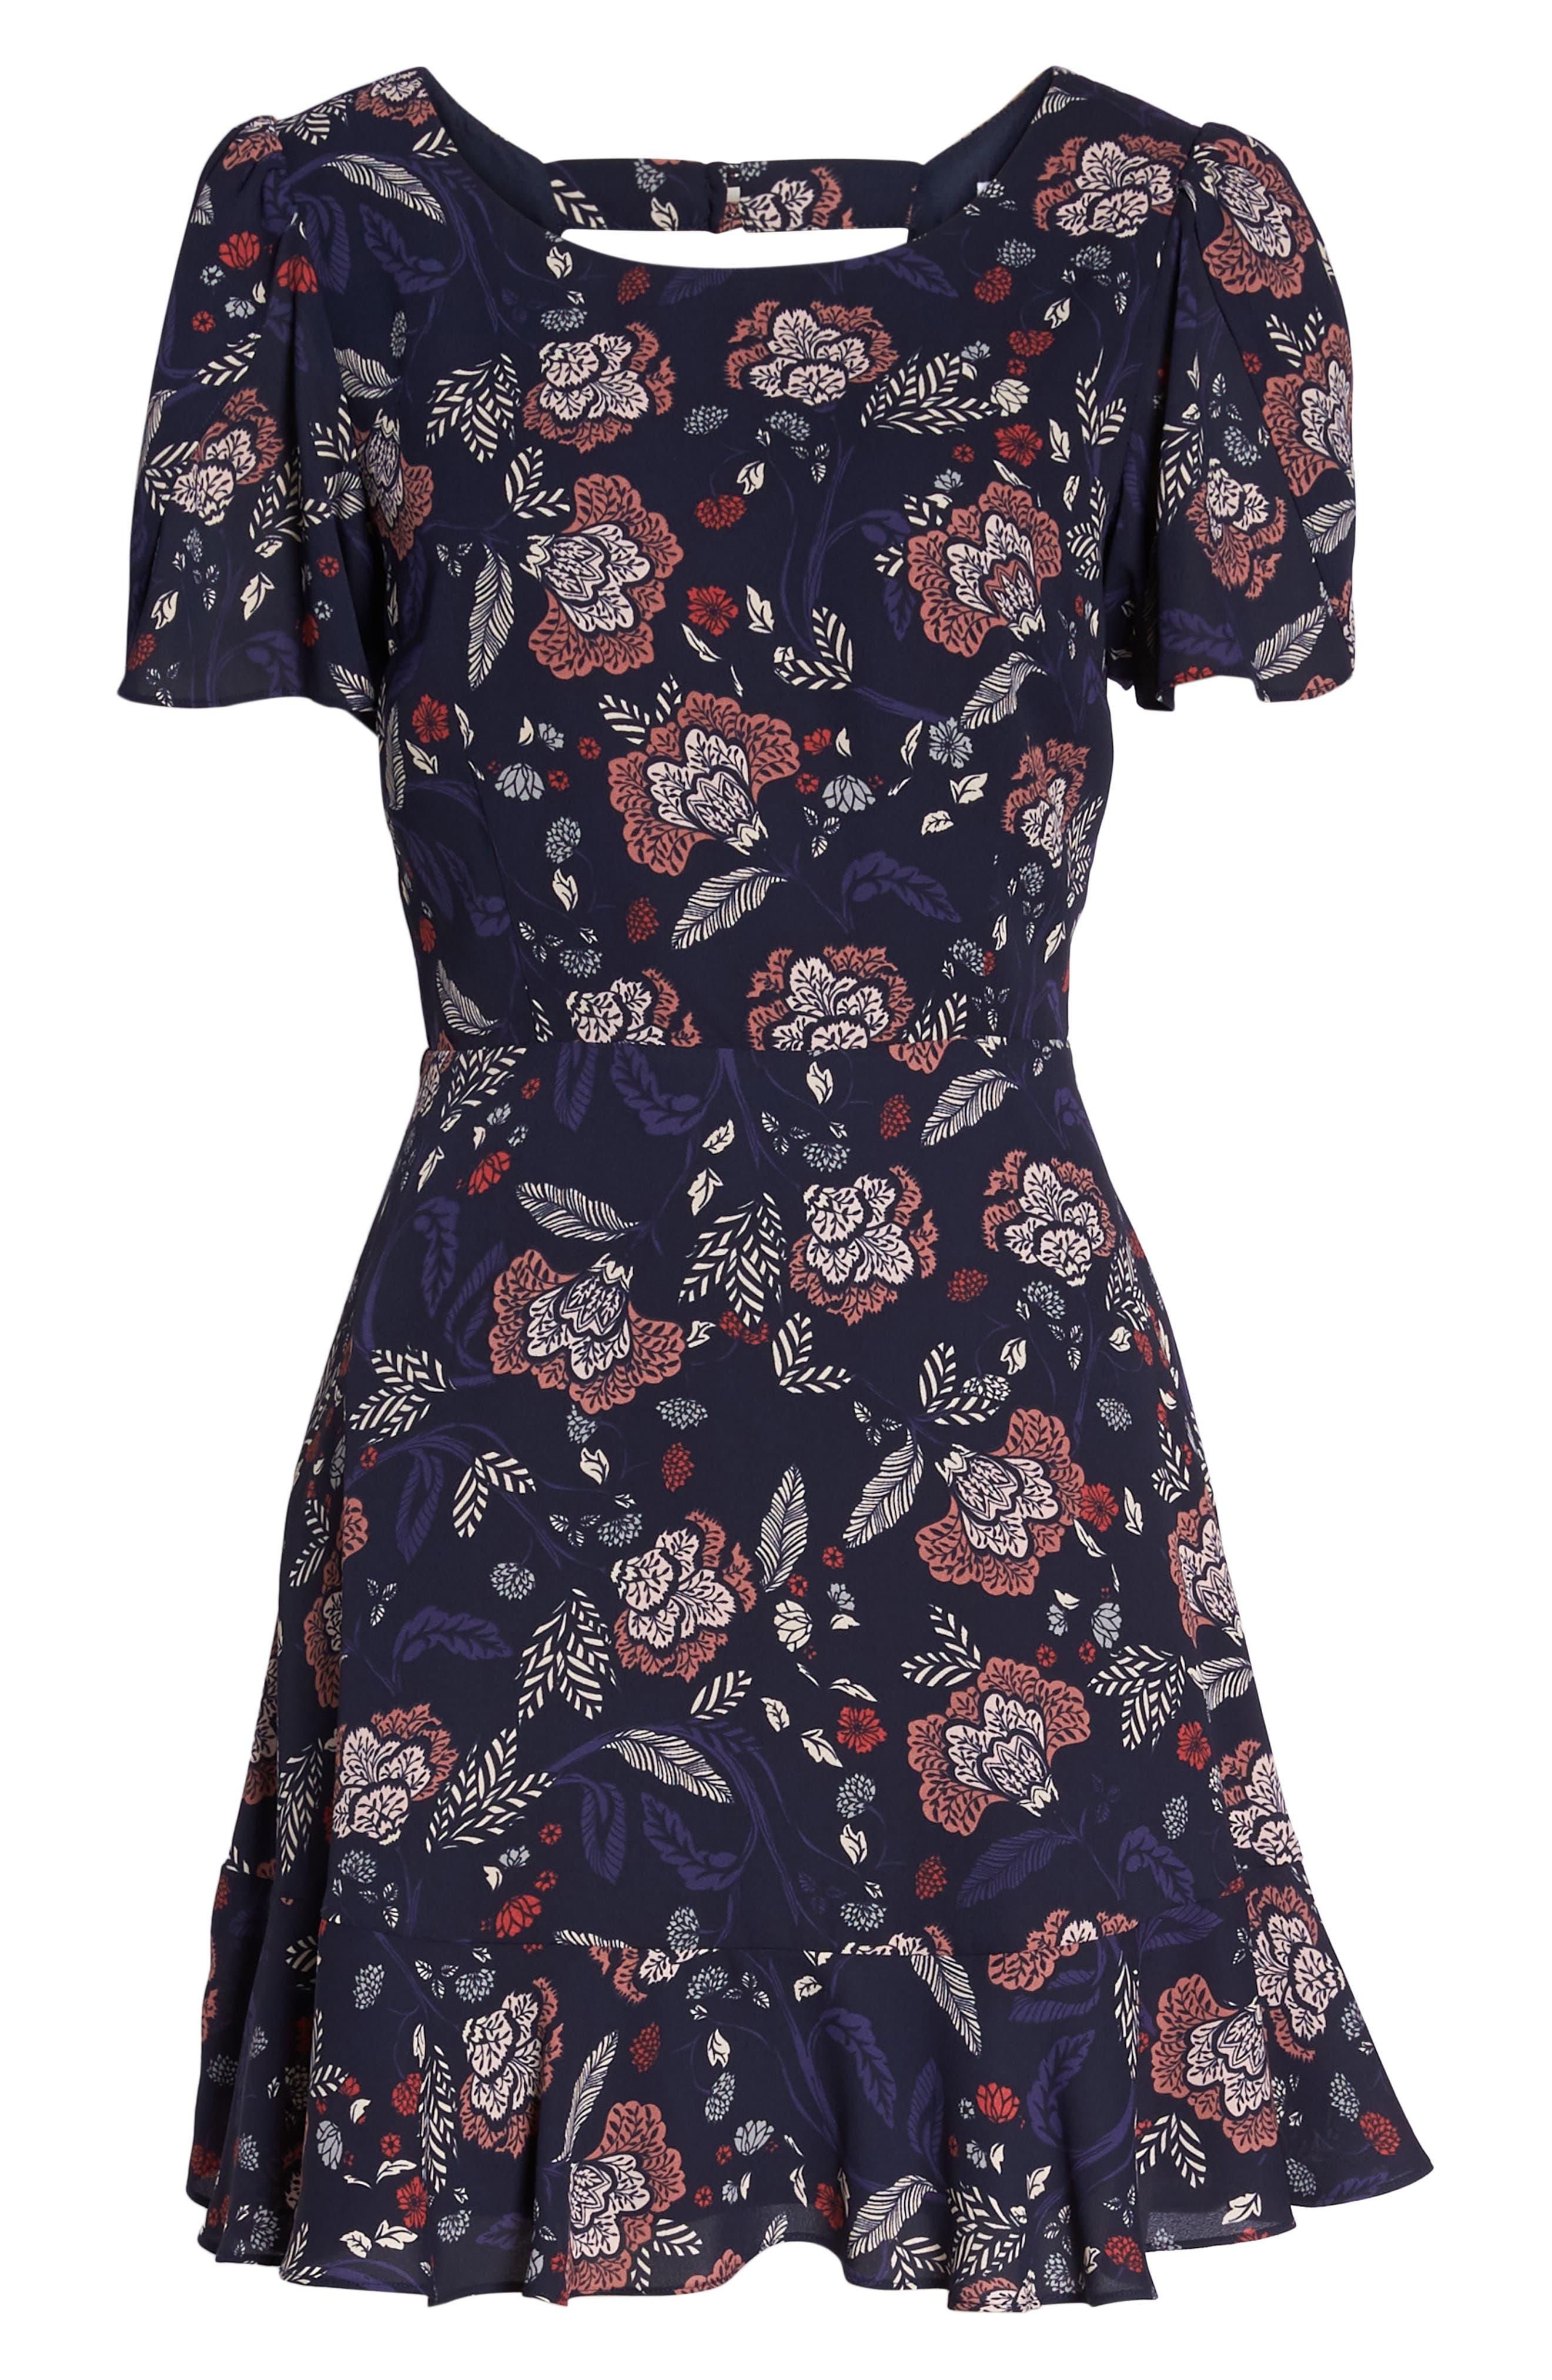 Cassidy Floral Minidress,                             Alternate thumbnail 7, color,                             410